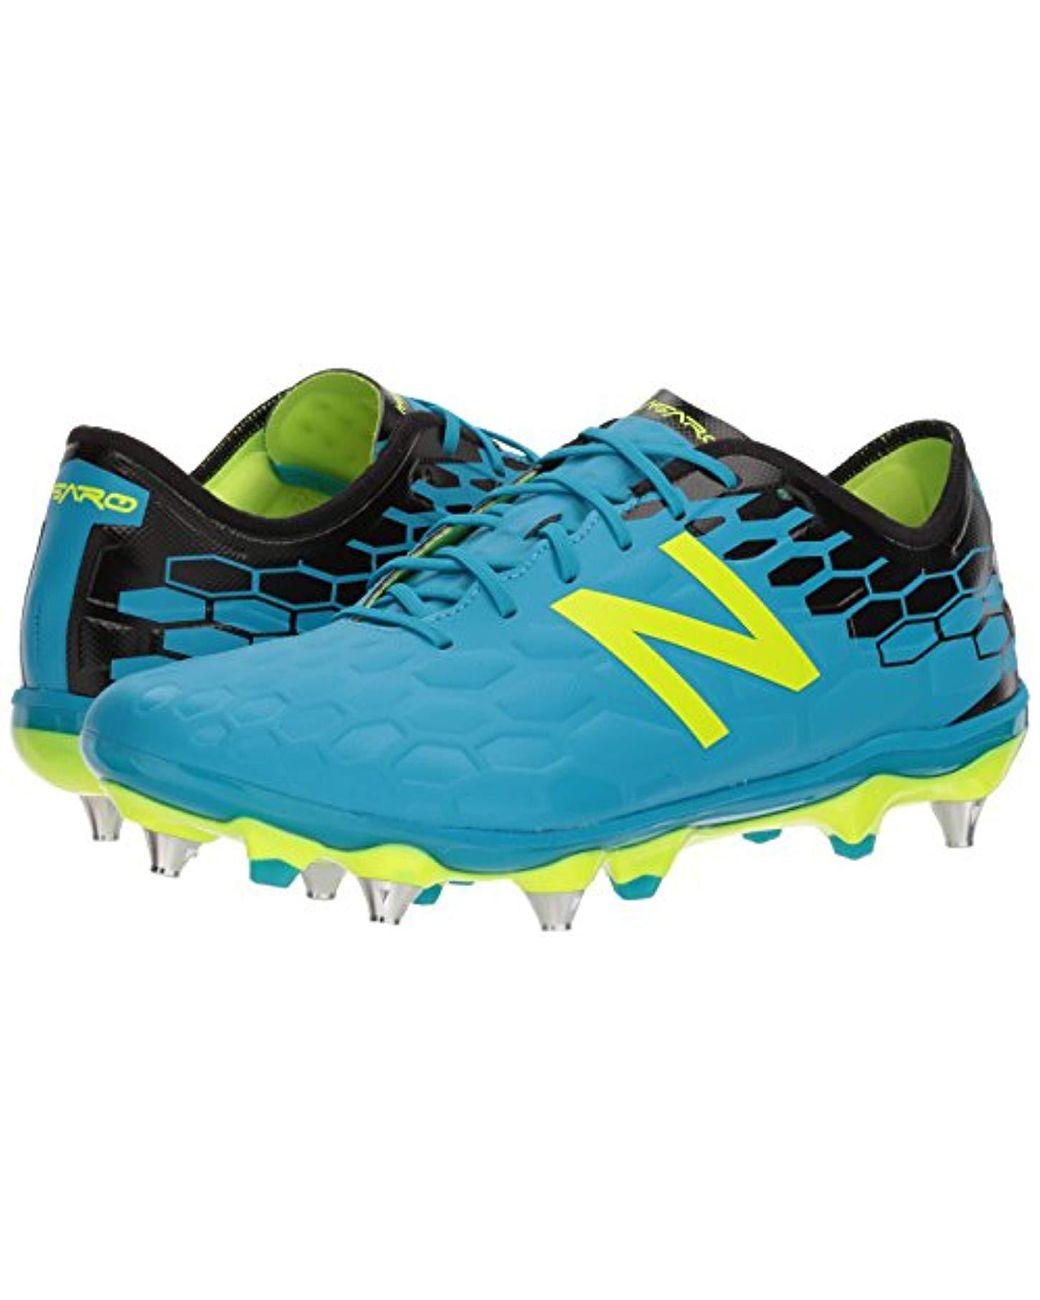 7bf21b43a6f2f New Balance Blue Visaro 2.0 Pro Sg Soccer Shoe for men